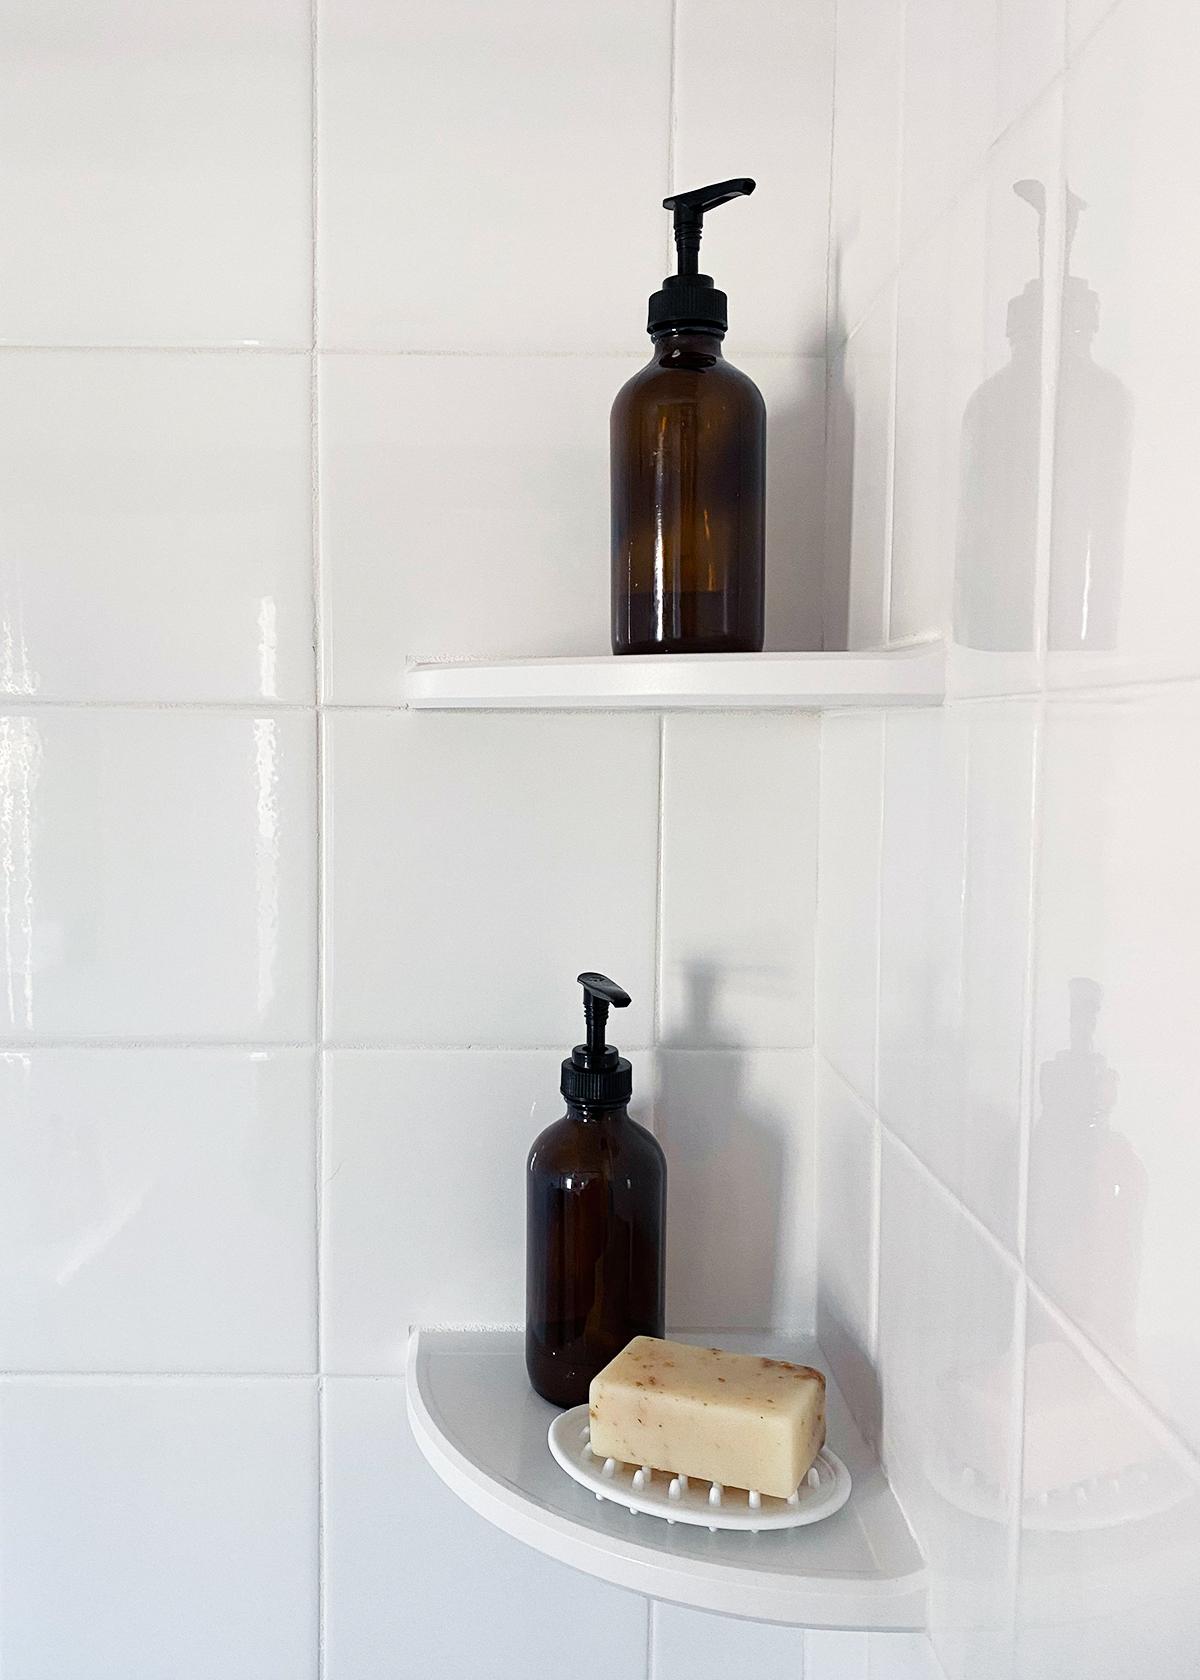 Shower Shelf Solutions for an Organized Shower